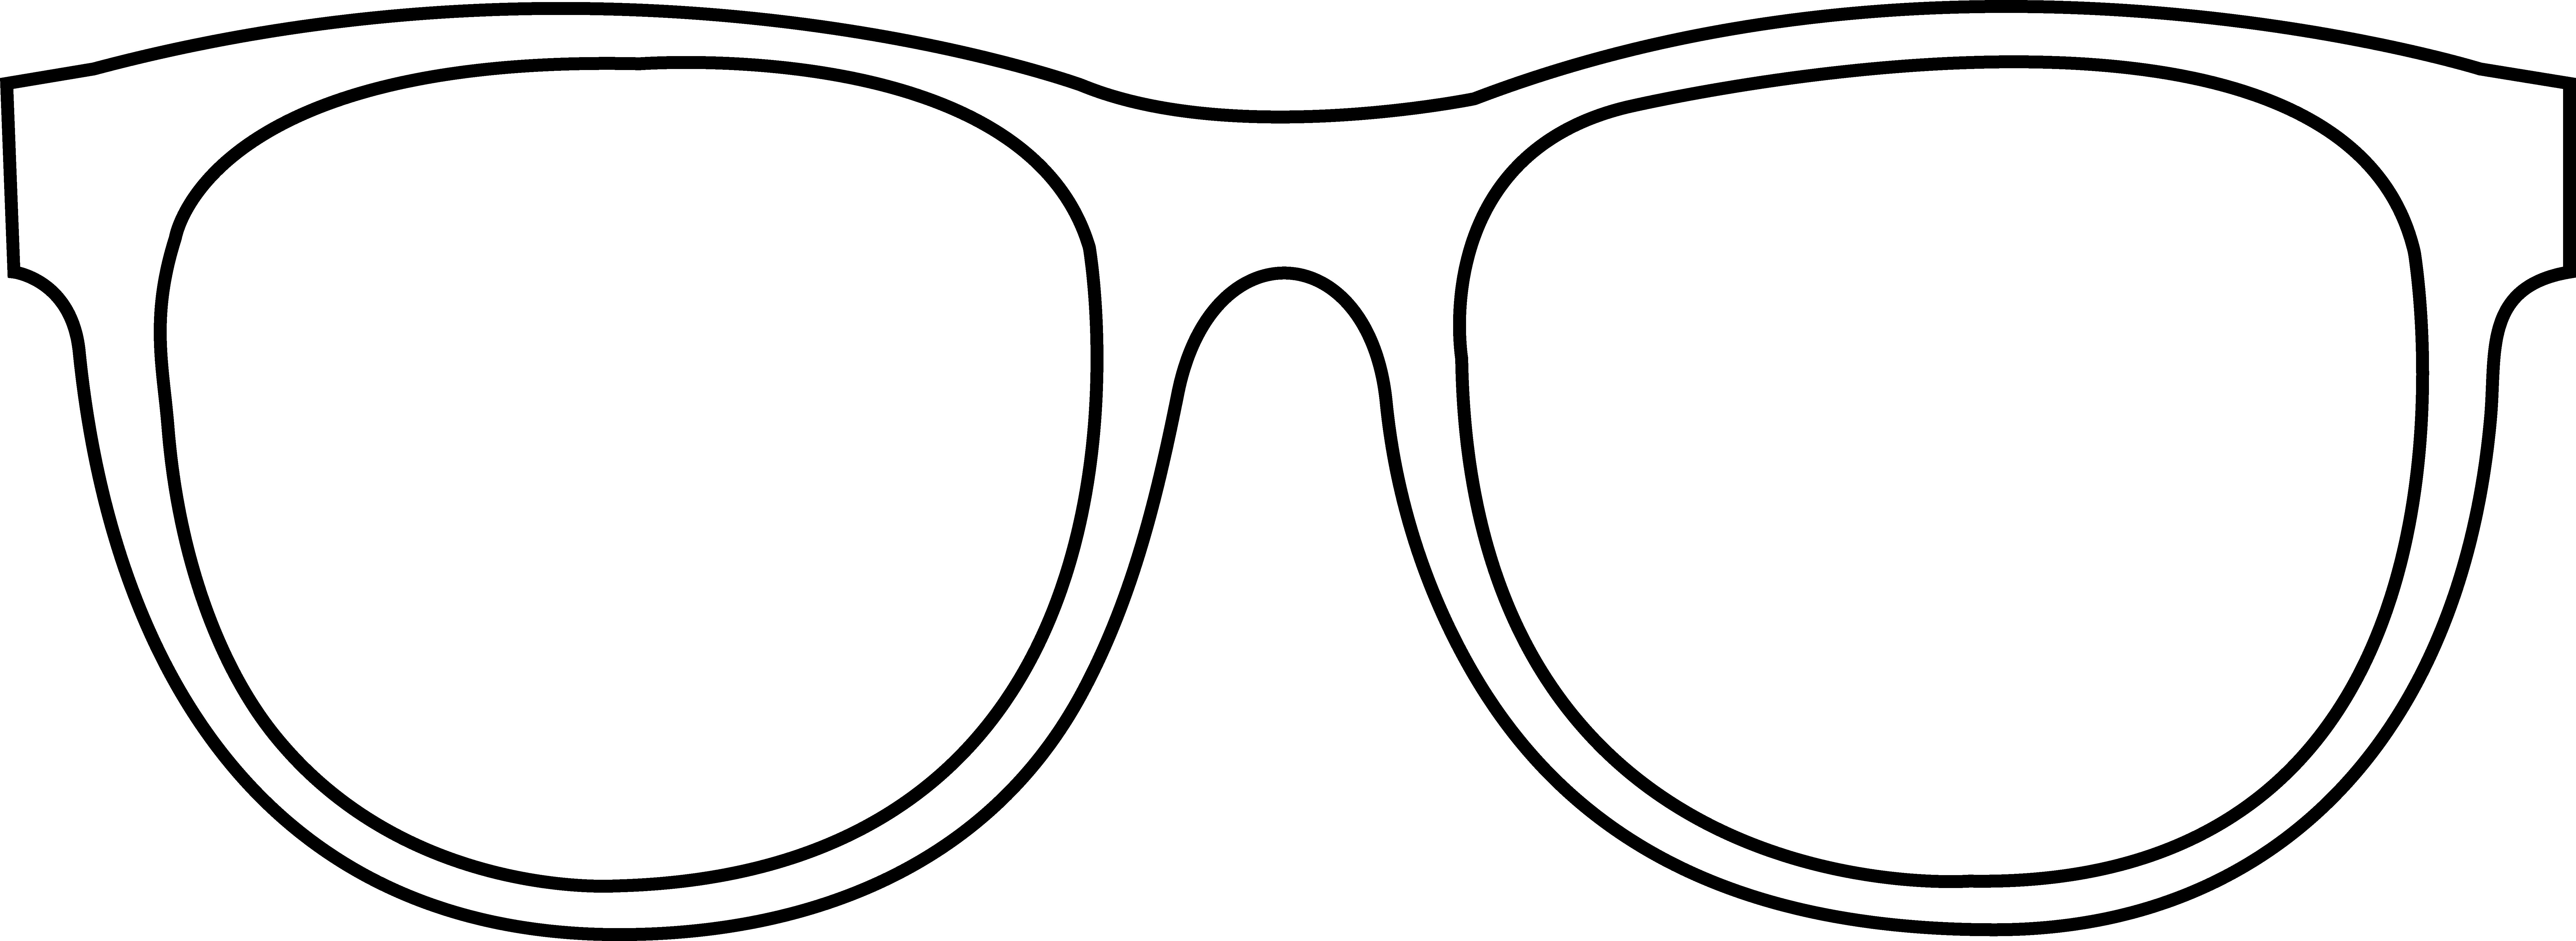 Line Art Glasses : Sunglasses clipart black and white panda free